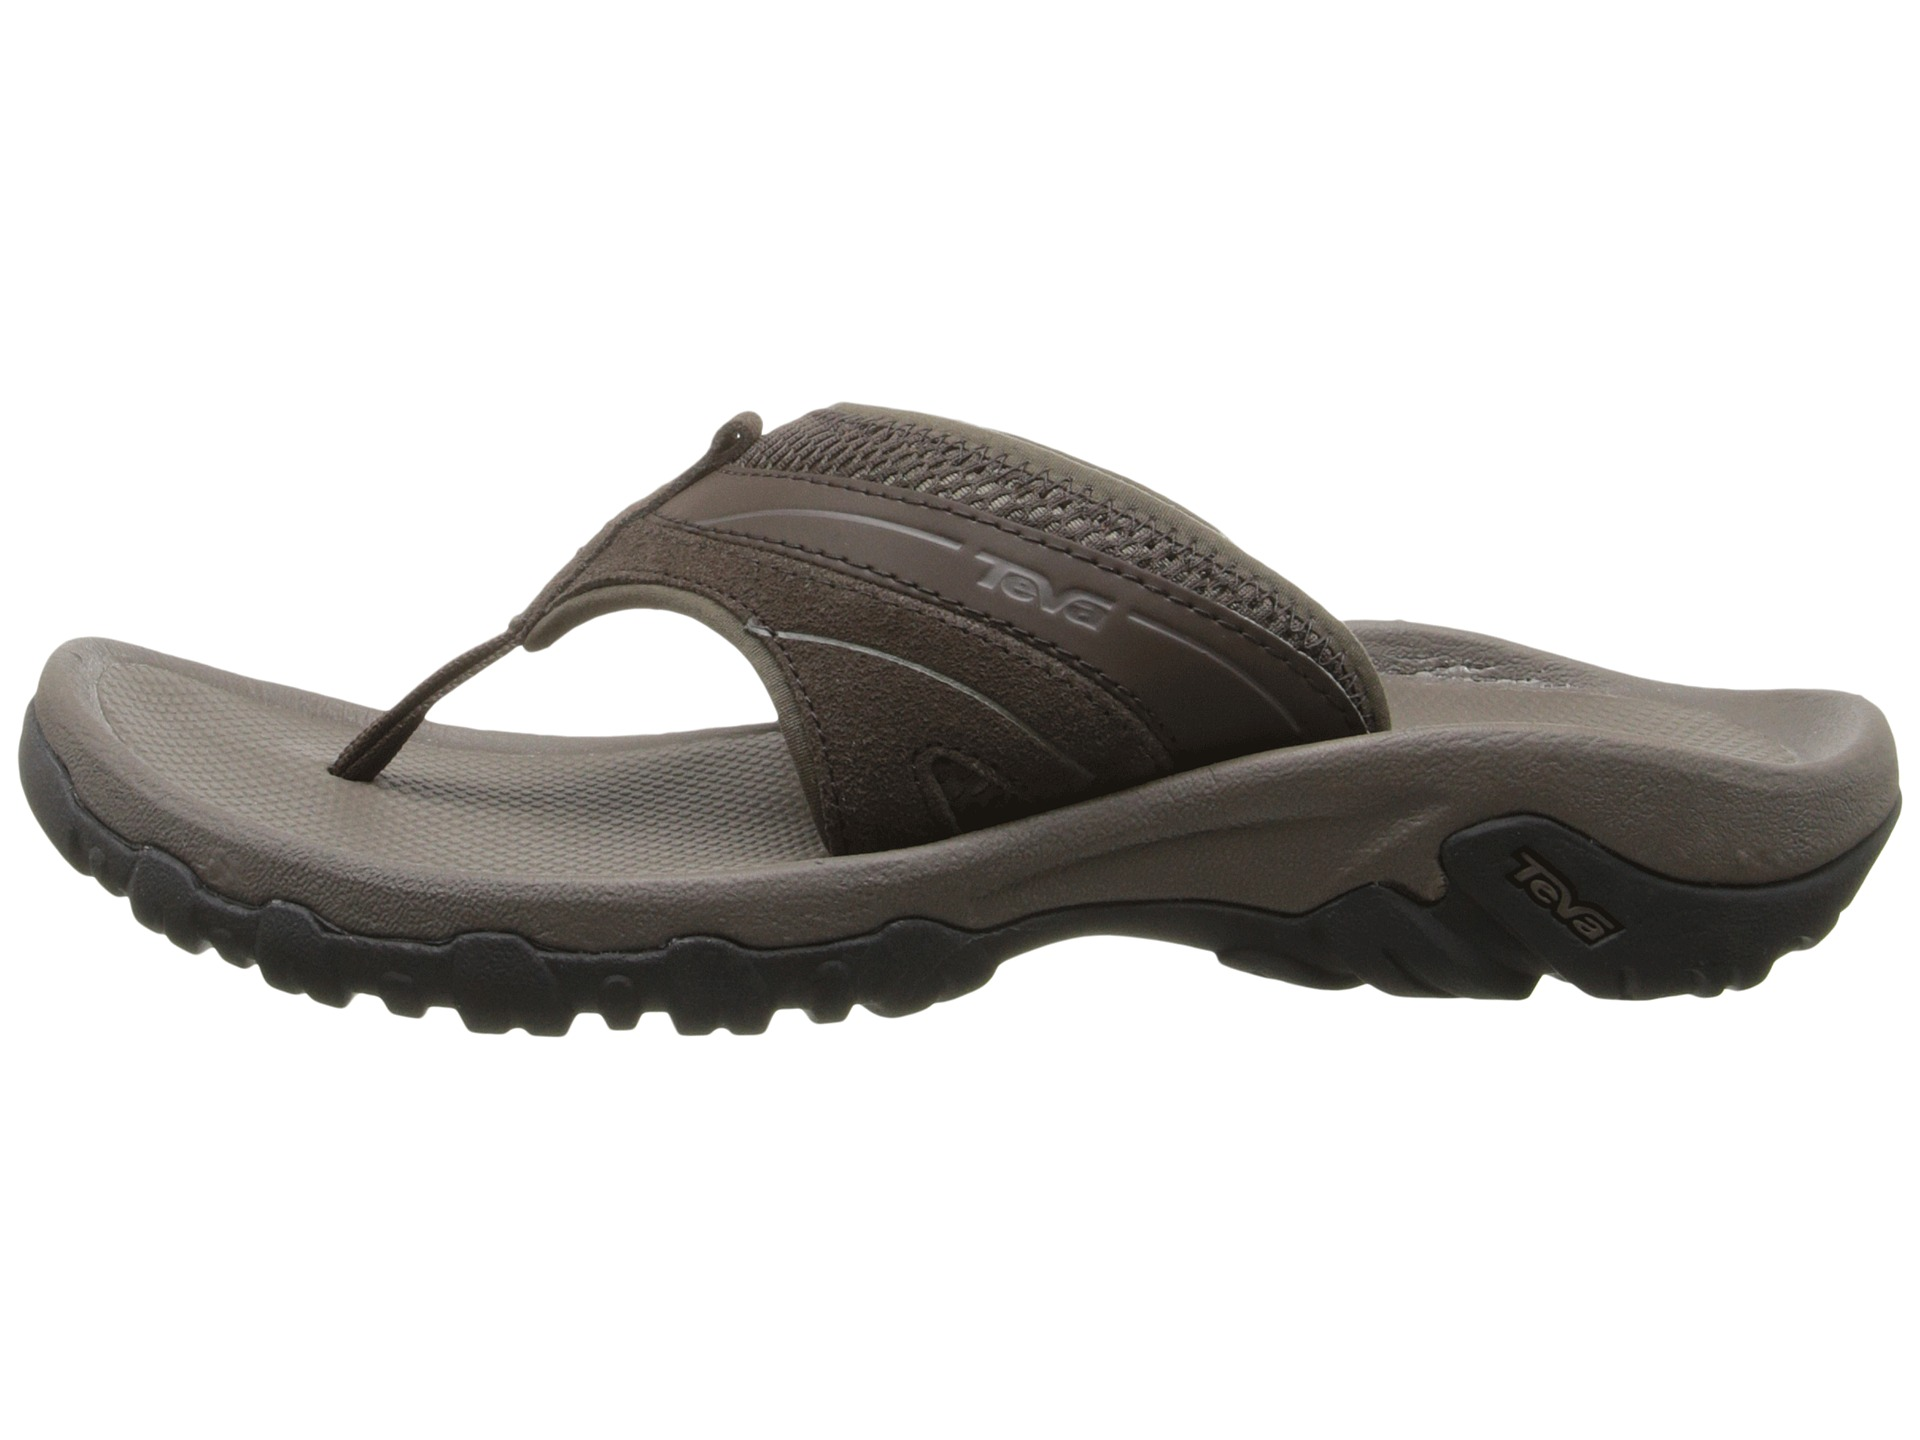 Scarpa Men S Vantage Climbing Shoe